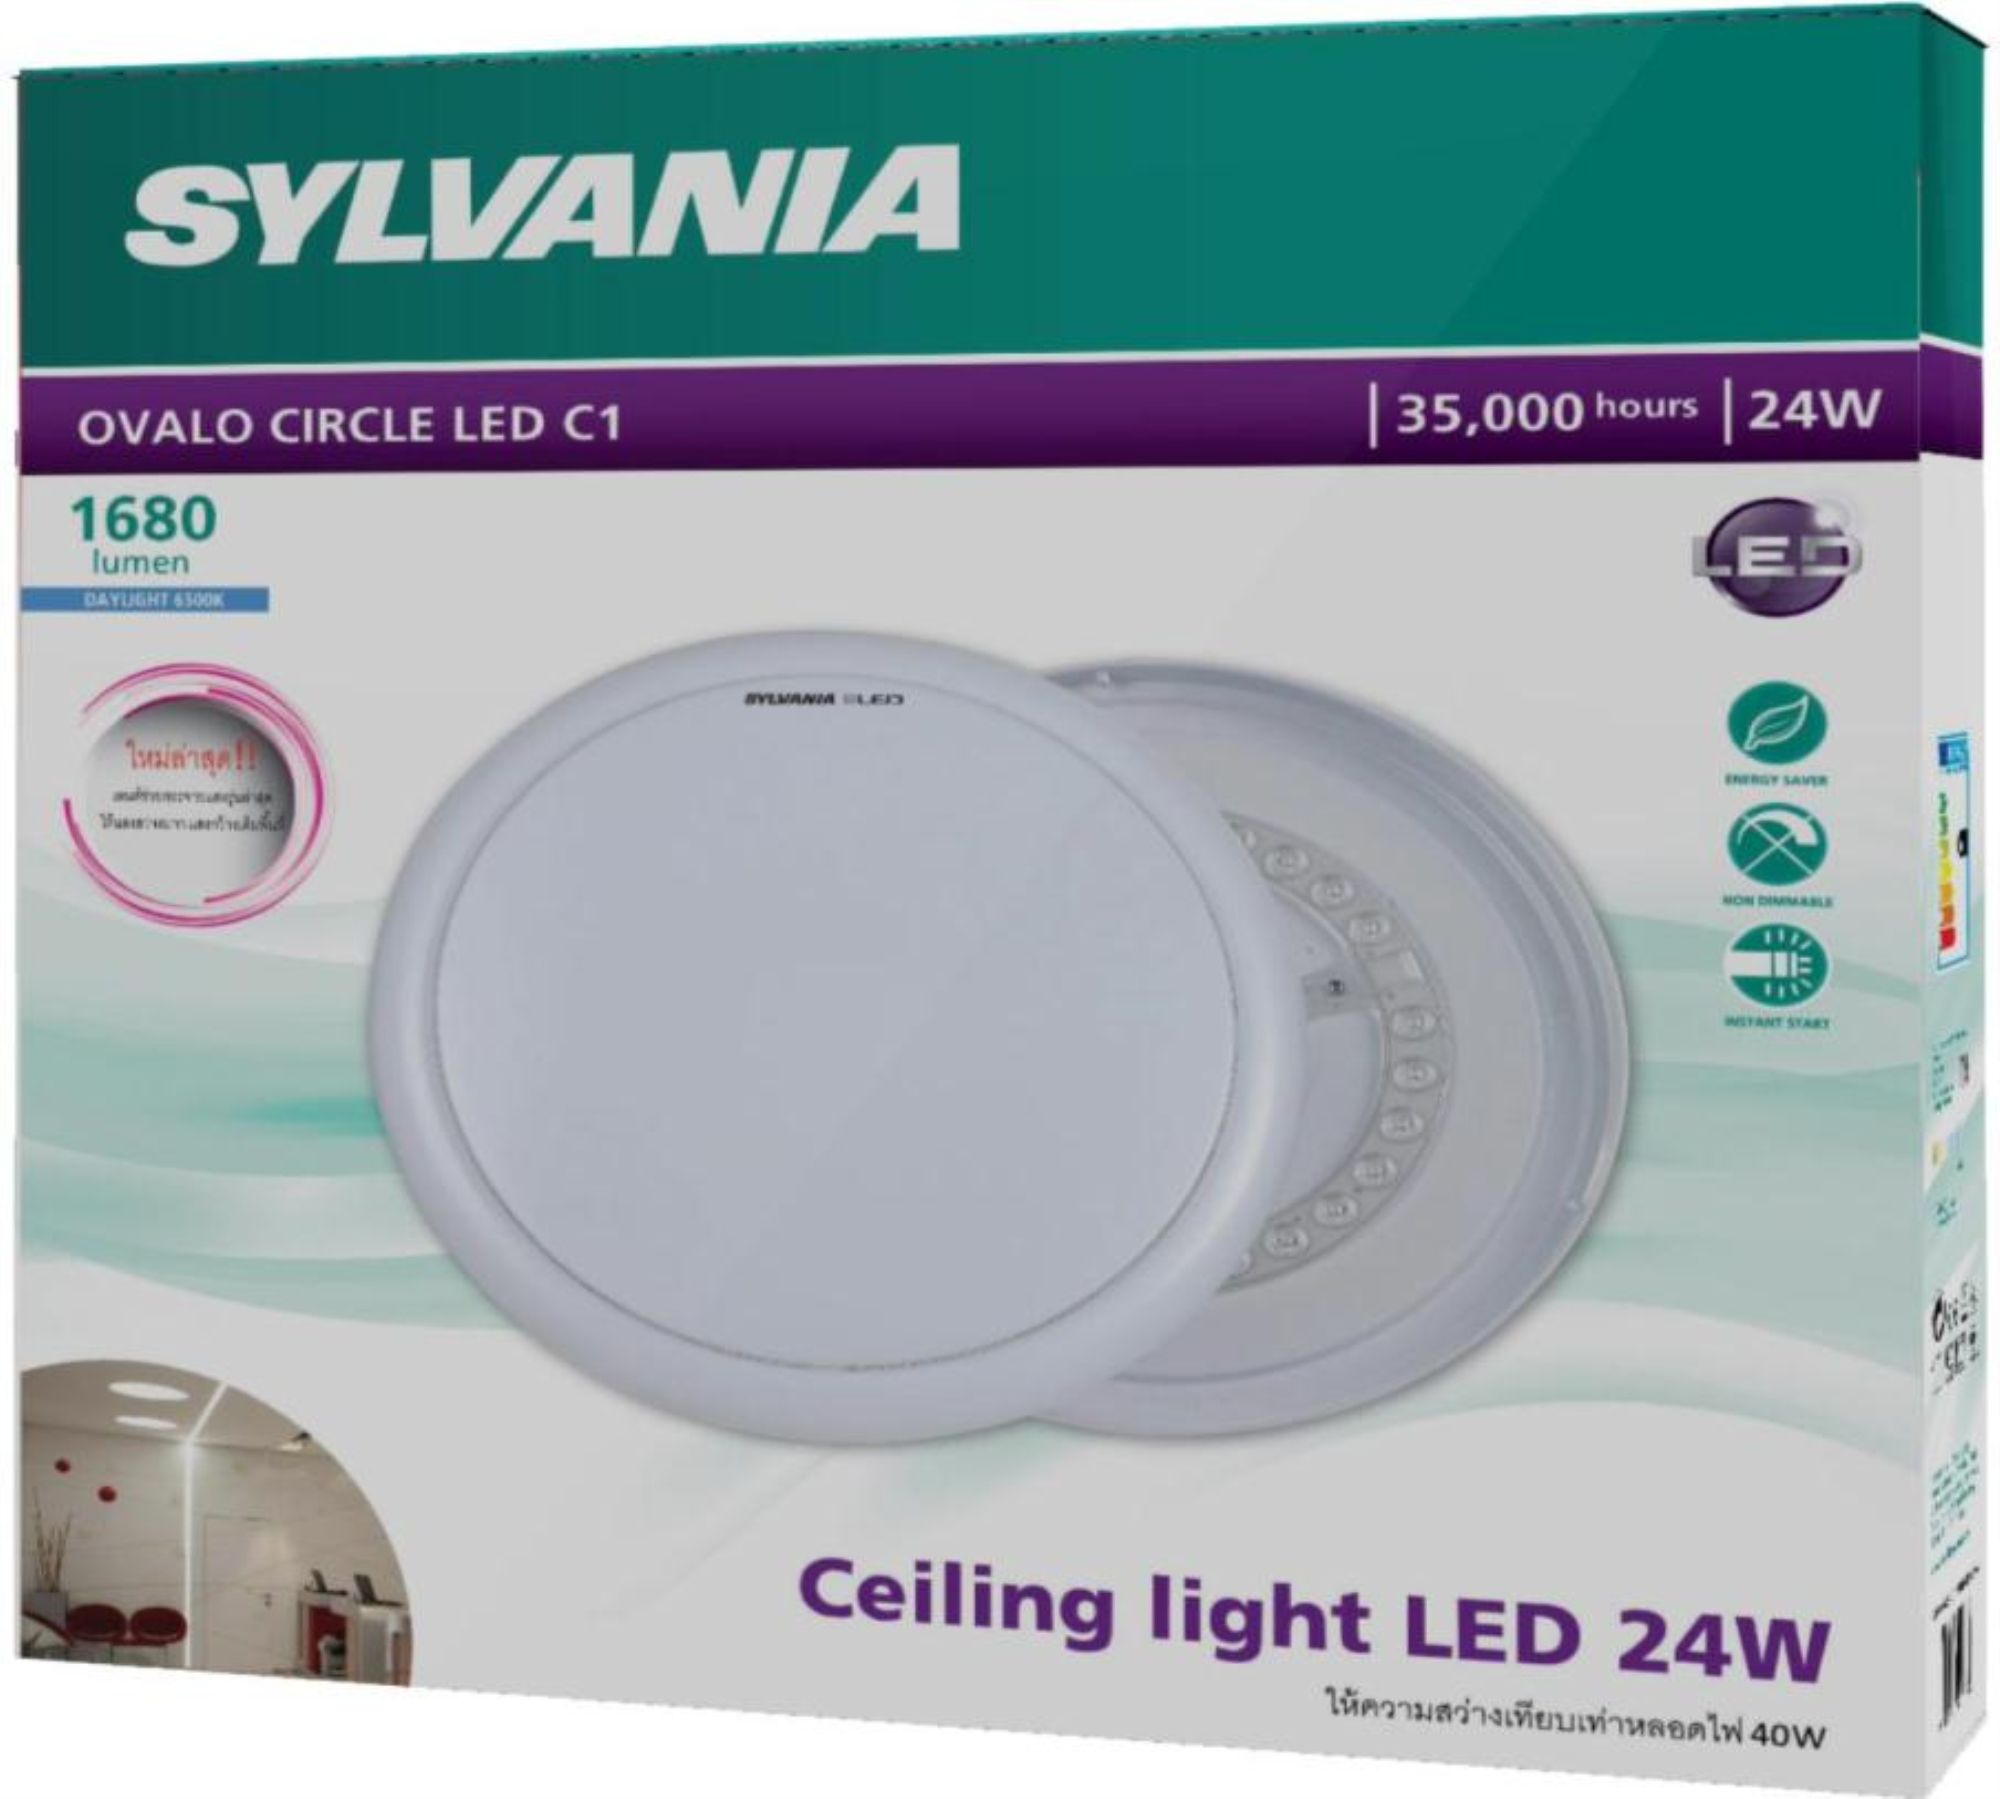 SYLVANIA ชุดโคมไฟเพดาน LED สำเร็จรูป OVALO CIRCLE LED C1 24W 6500K แสงเดย์ไลท์